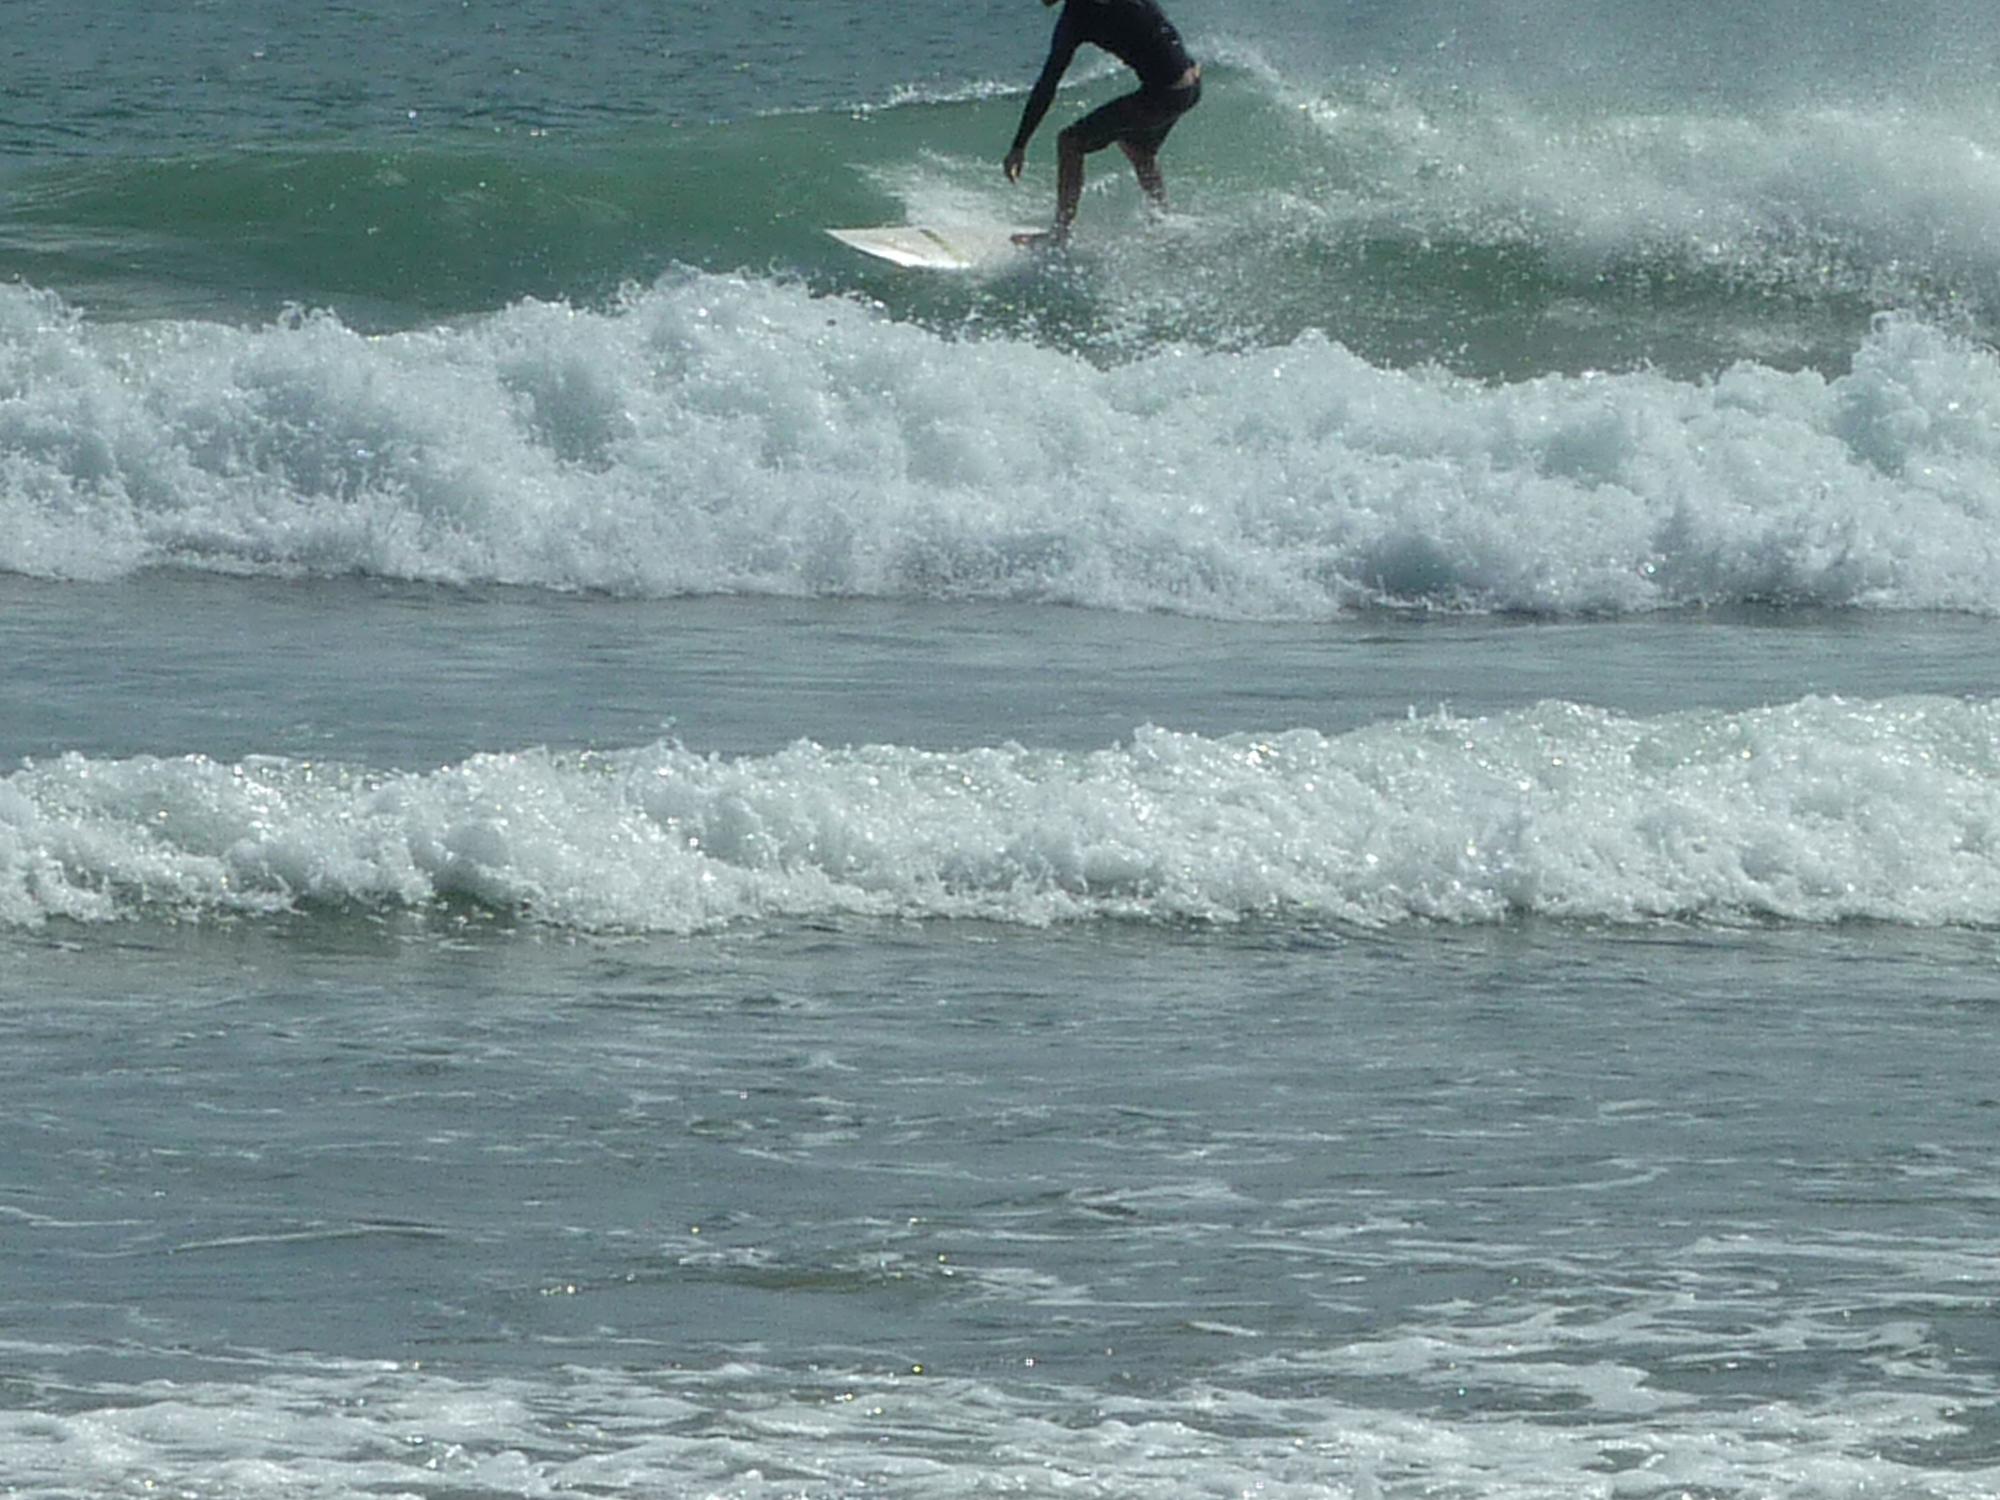 Kuta - surf guide service - YOEXPLORE.co.id